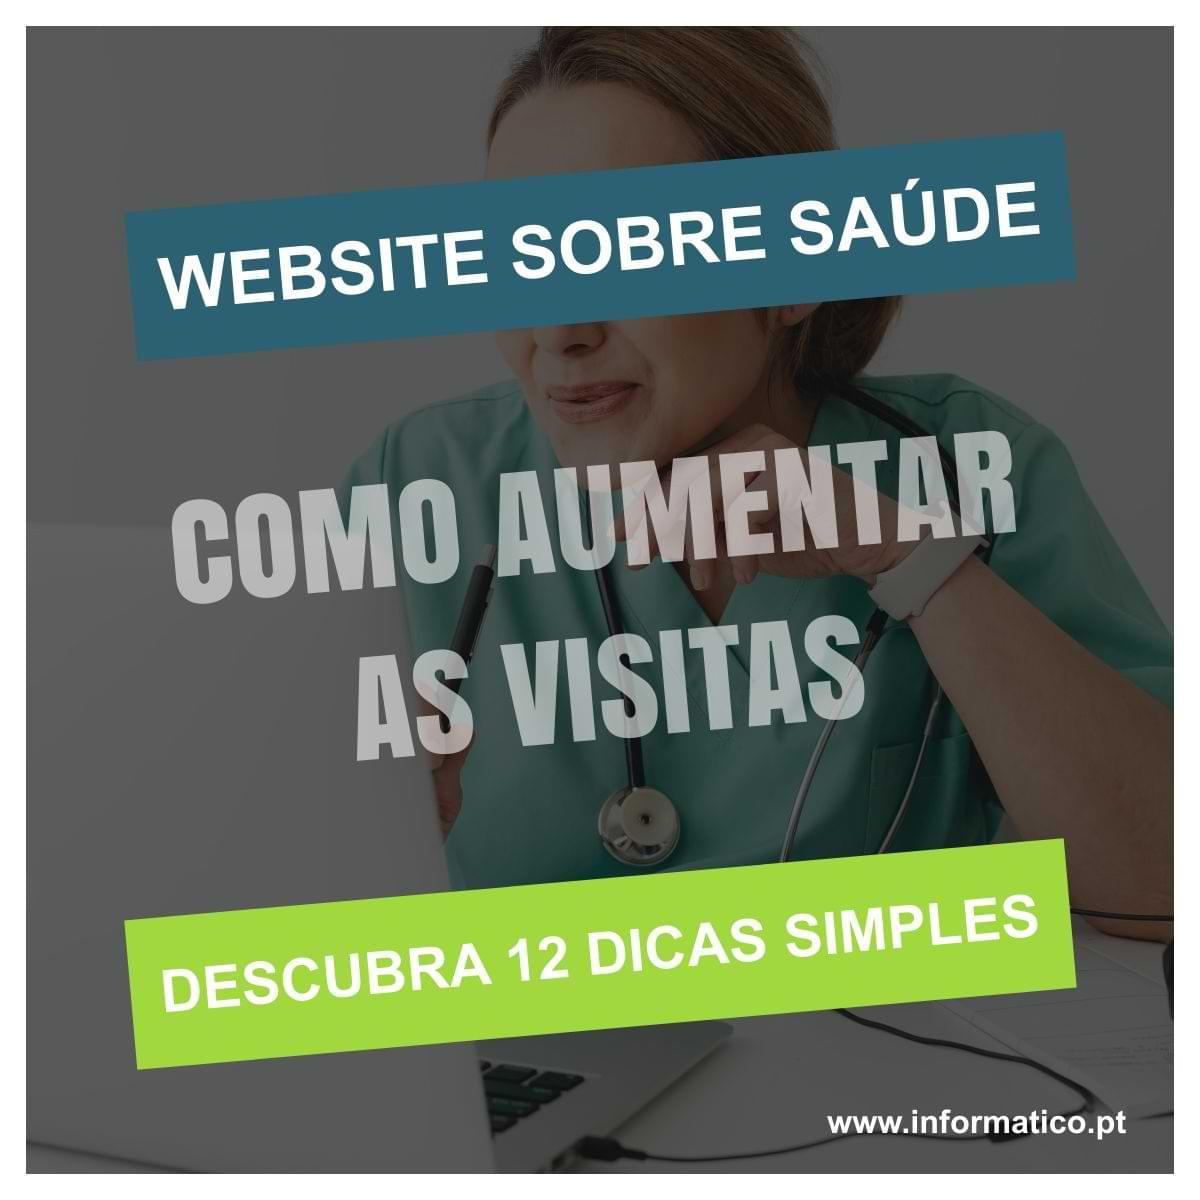 WEBSITE SOBRE SAUDE - AUMENTAR VISITAS